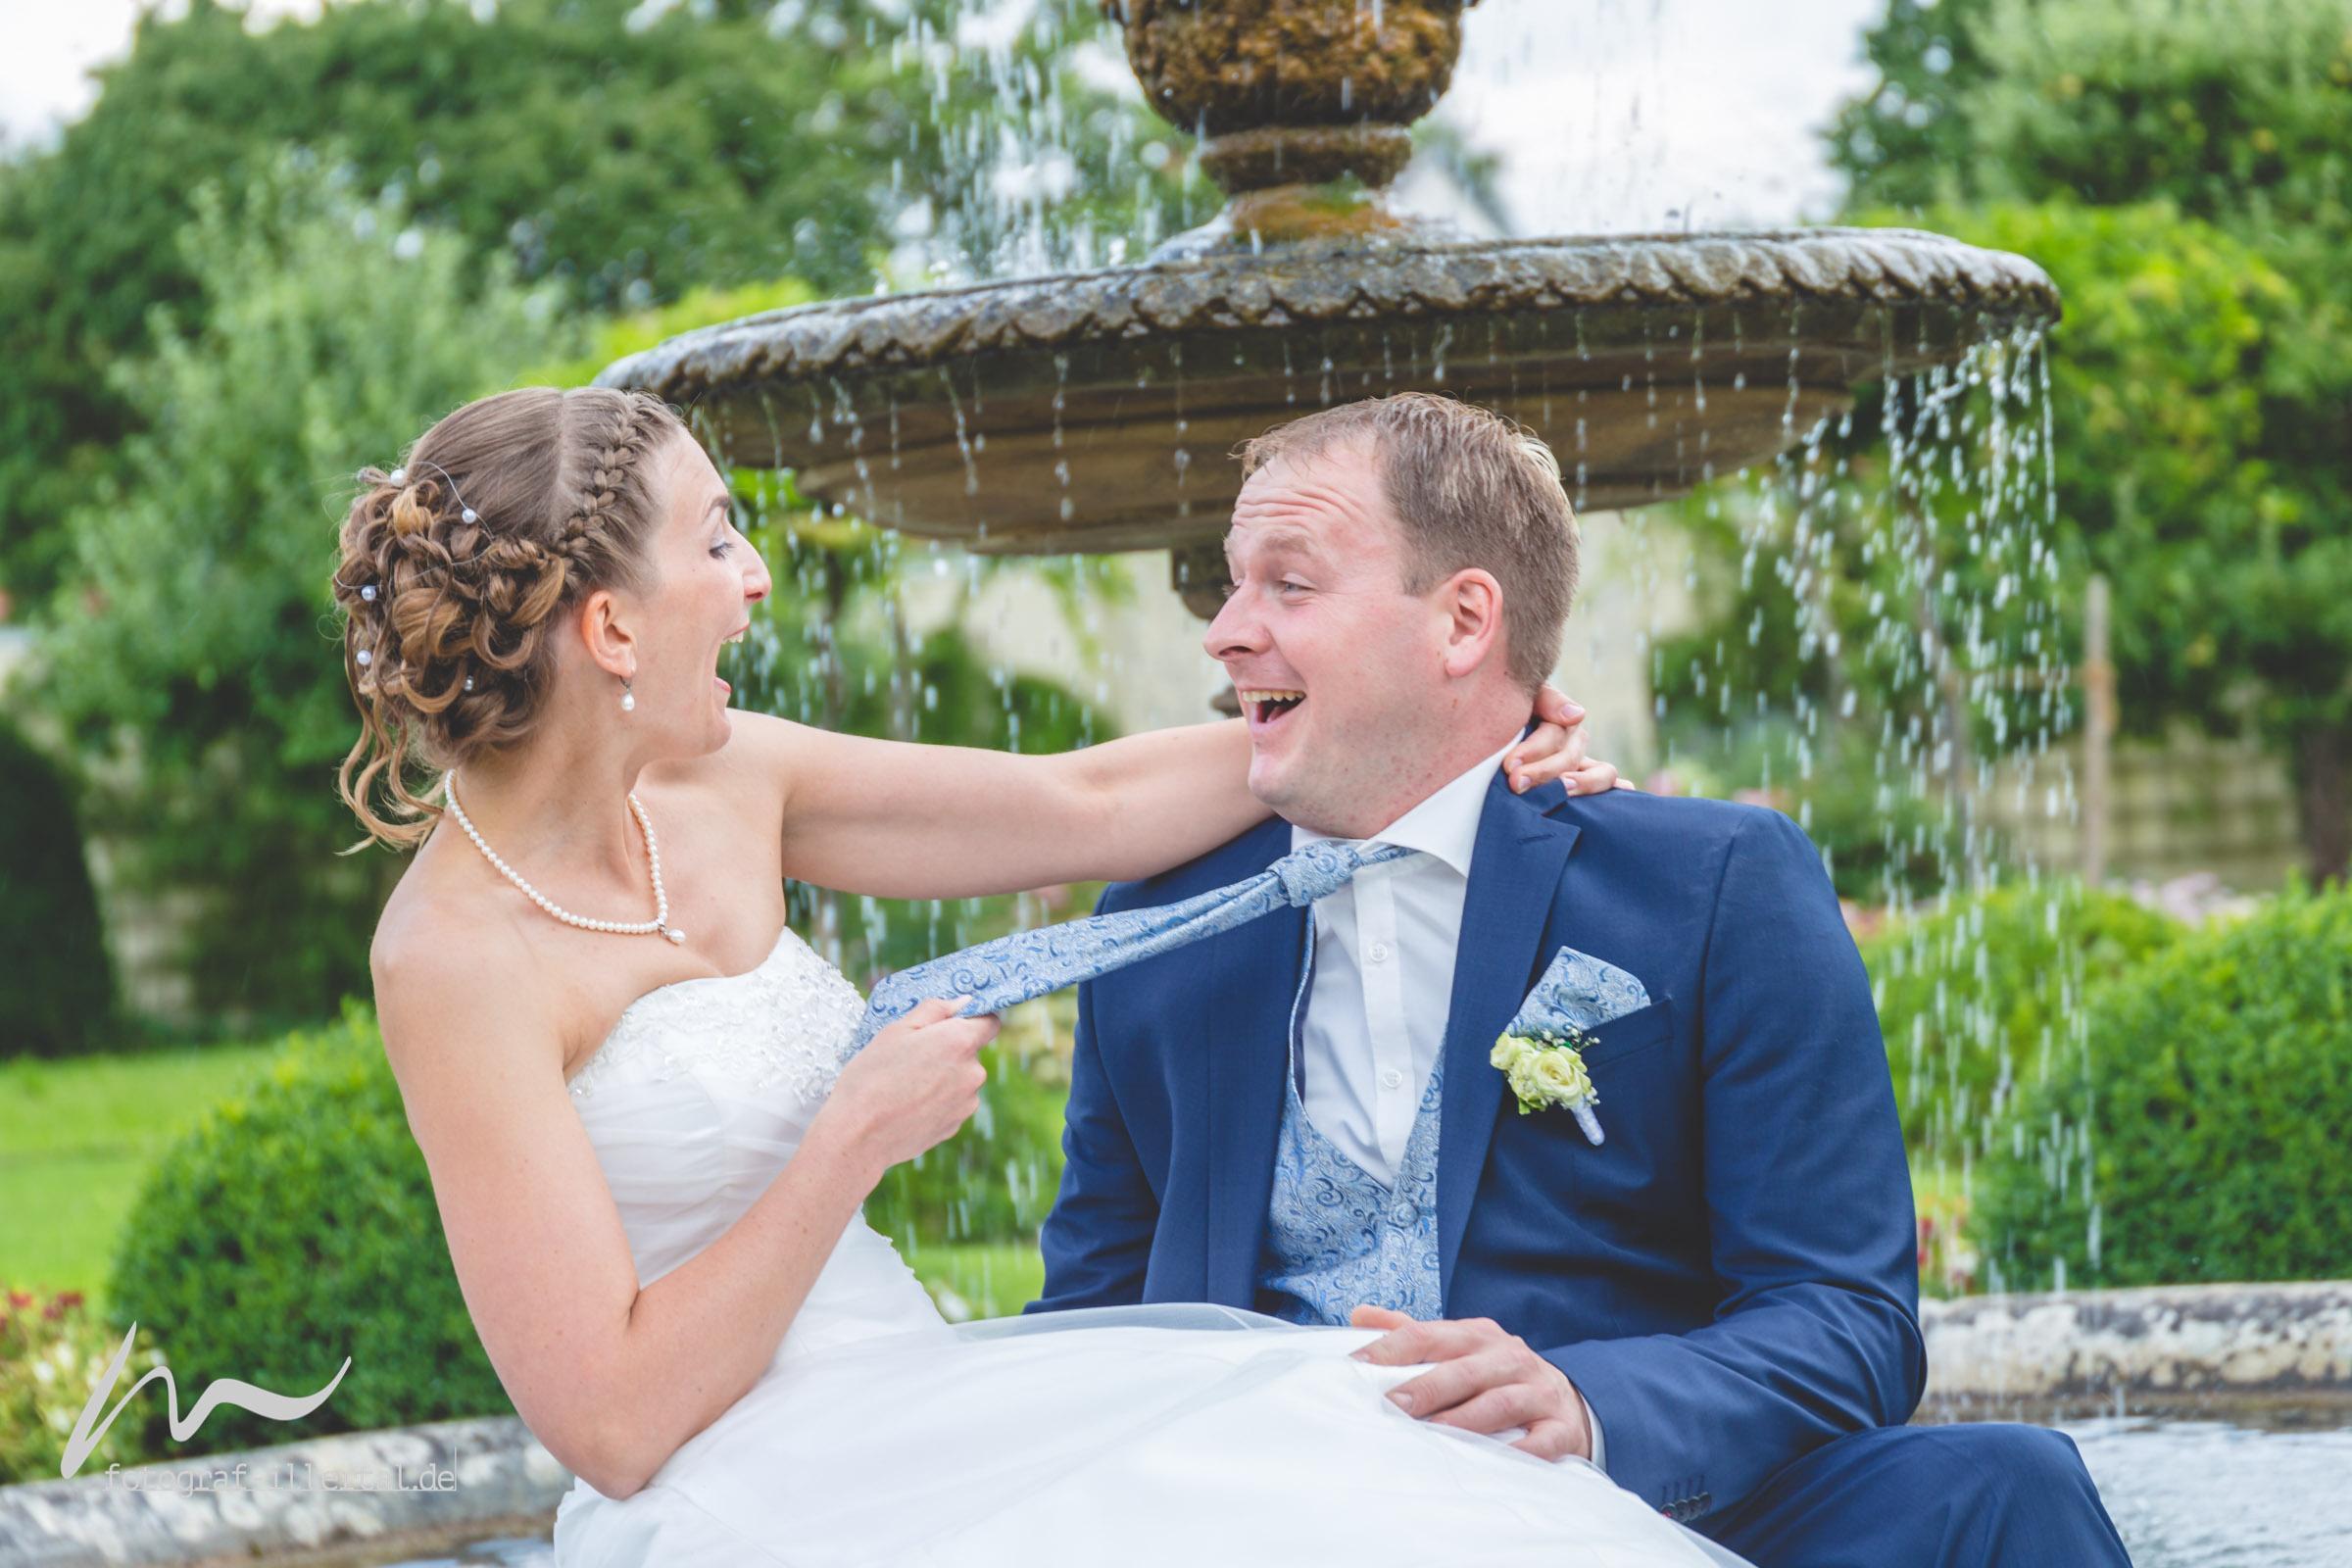 Fotograf Illertal-Christian Miller-Hochzeitsfotografie-_MG_3696